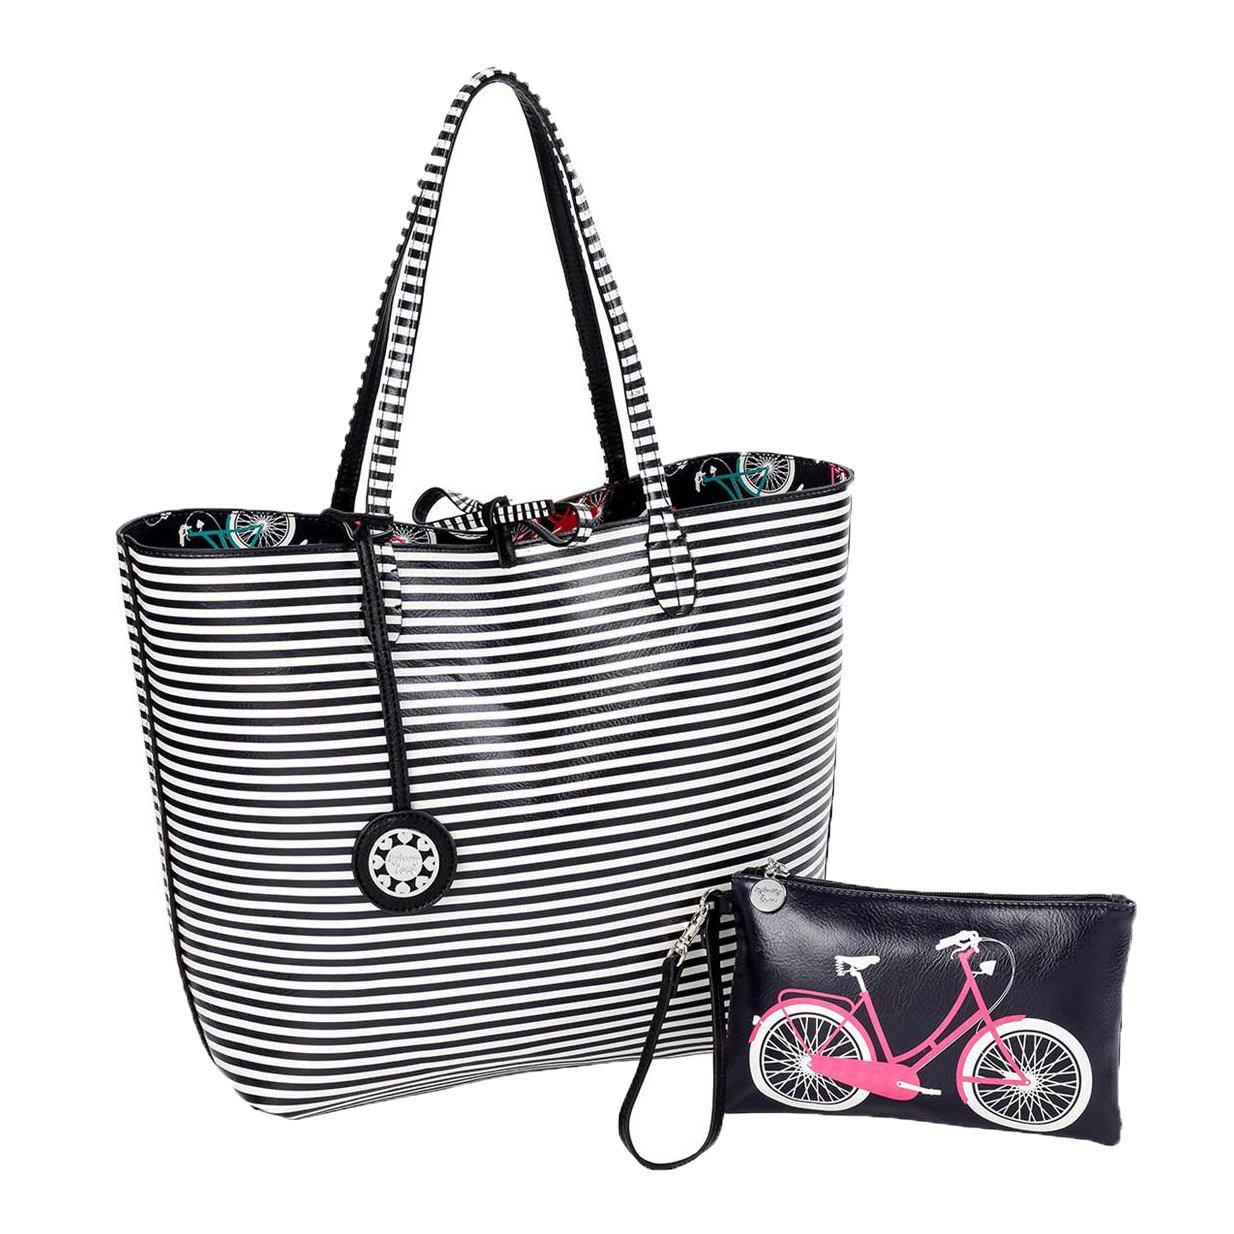 Sydney Love Easy Rider Reversible Tote & Wristlet Set, Bicycle / Stripes